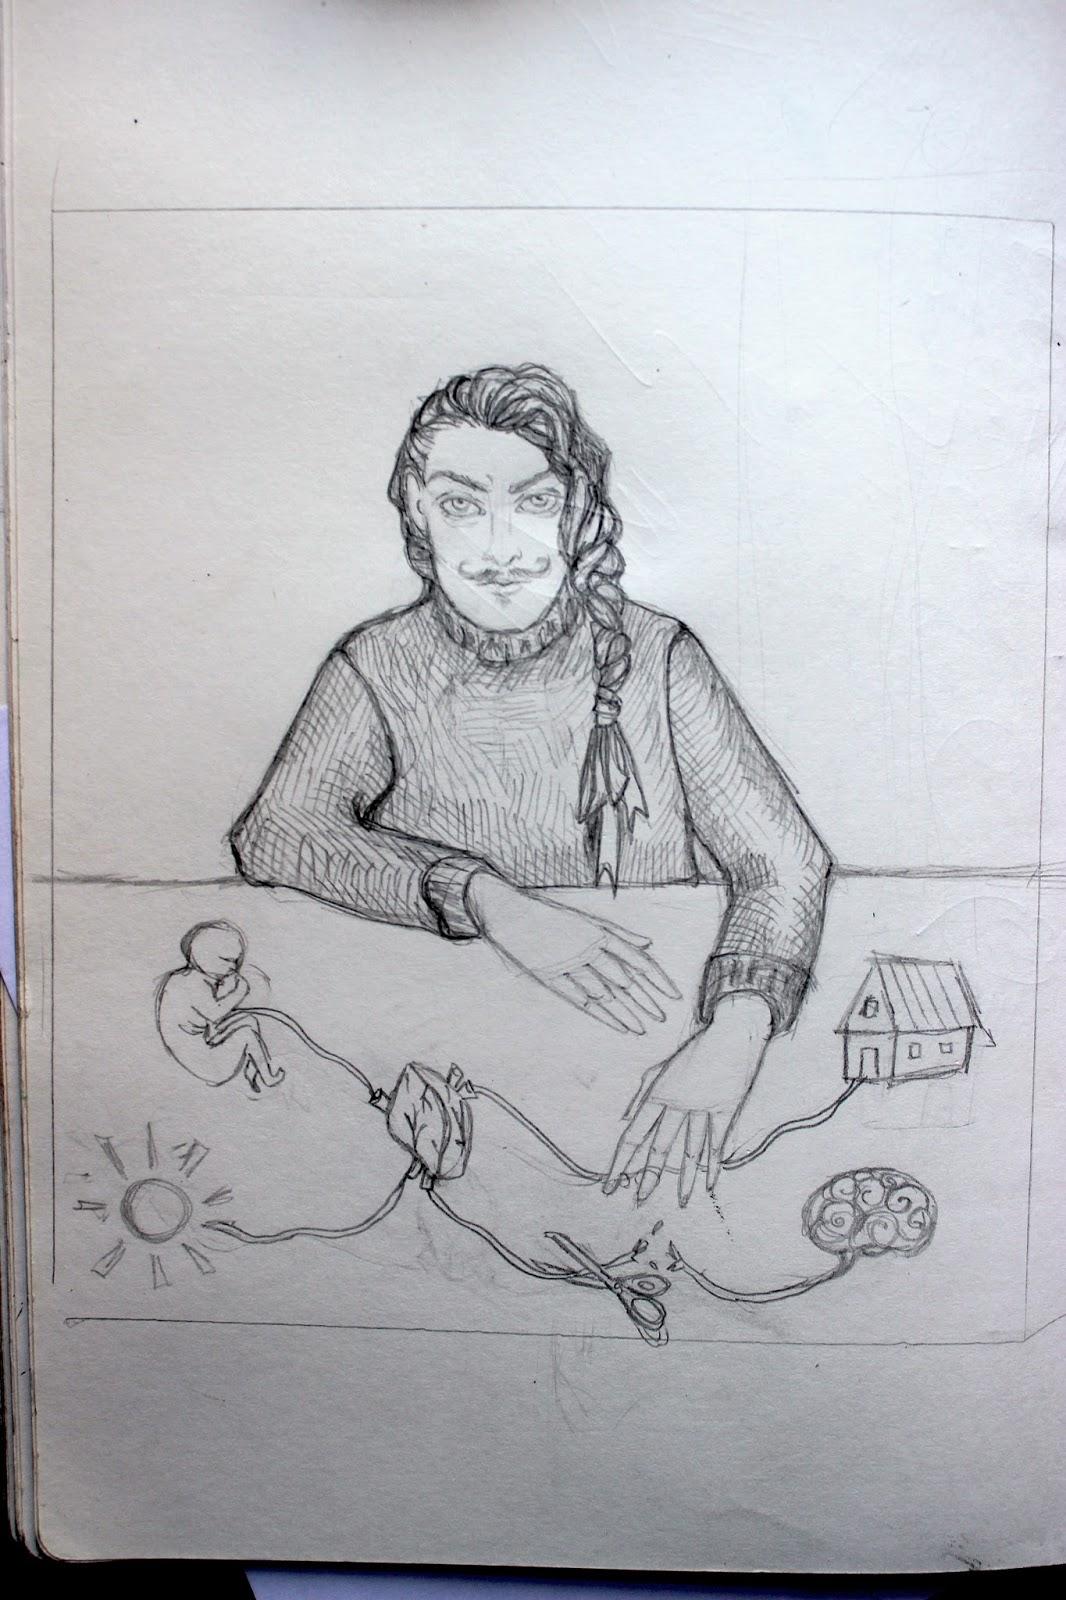 Sketchpad Notebook Sketch Drawing Pencil Portrait Mind Map Moustache